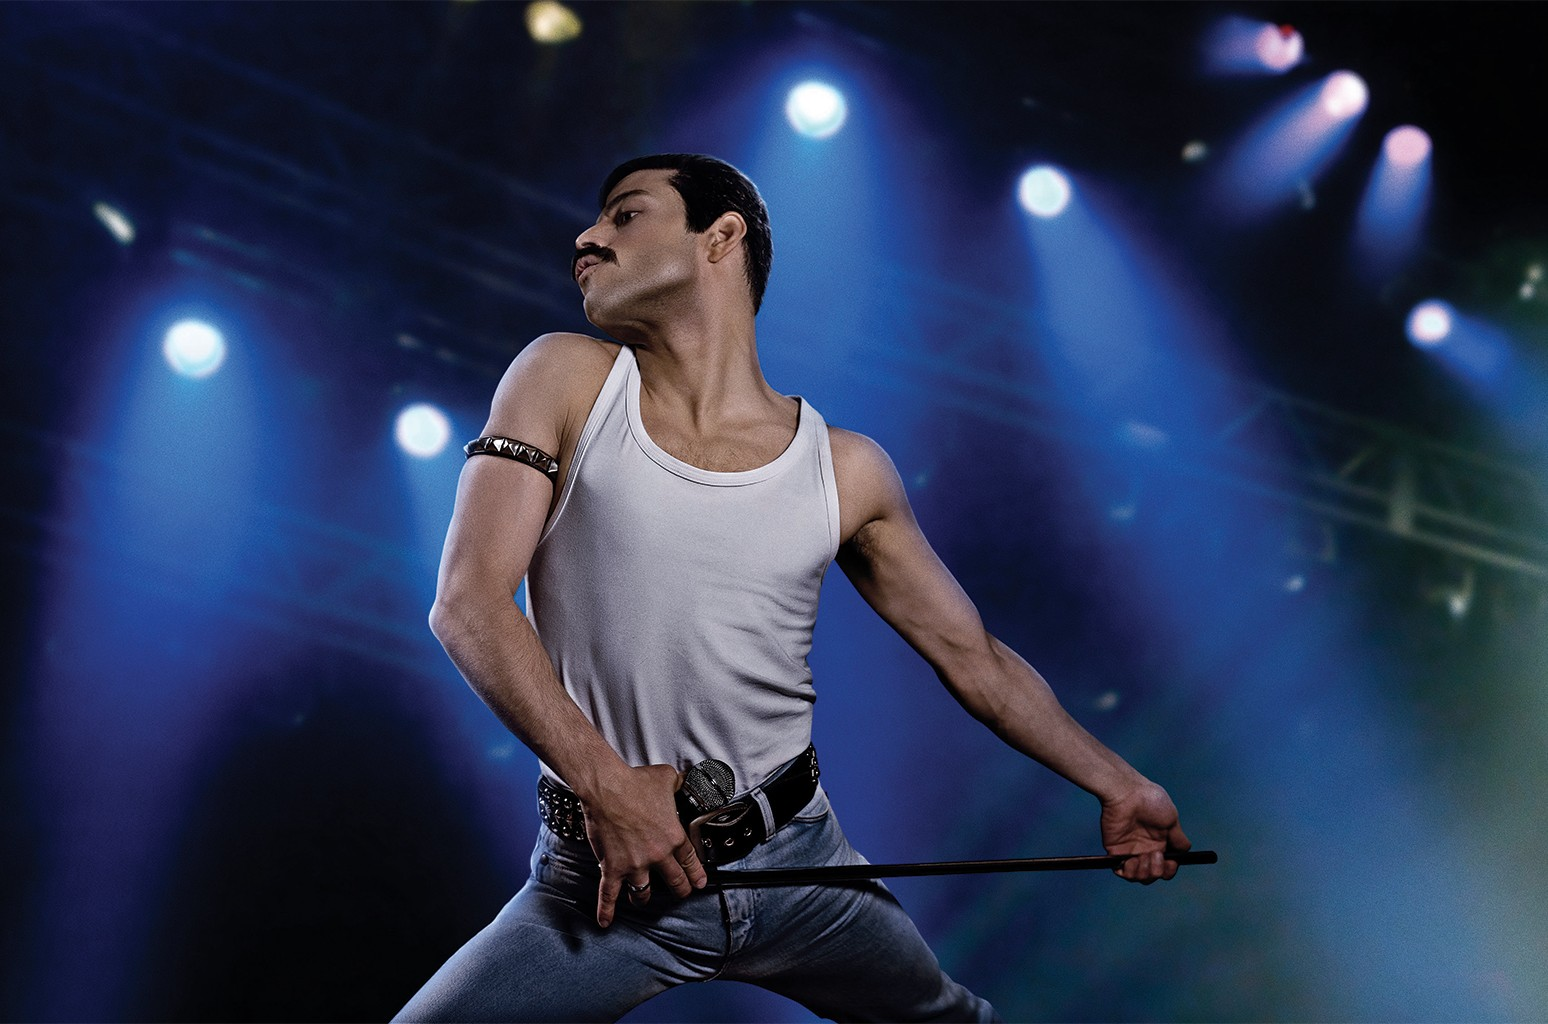 Rami Malek as rock icon Freddie Mercury in Bohemian Rhapsody.